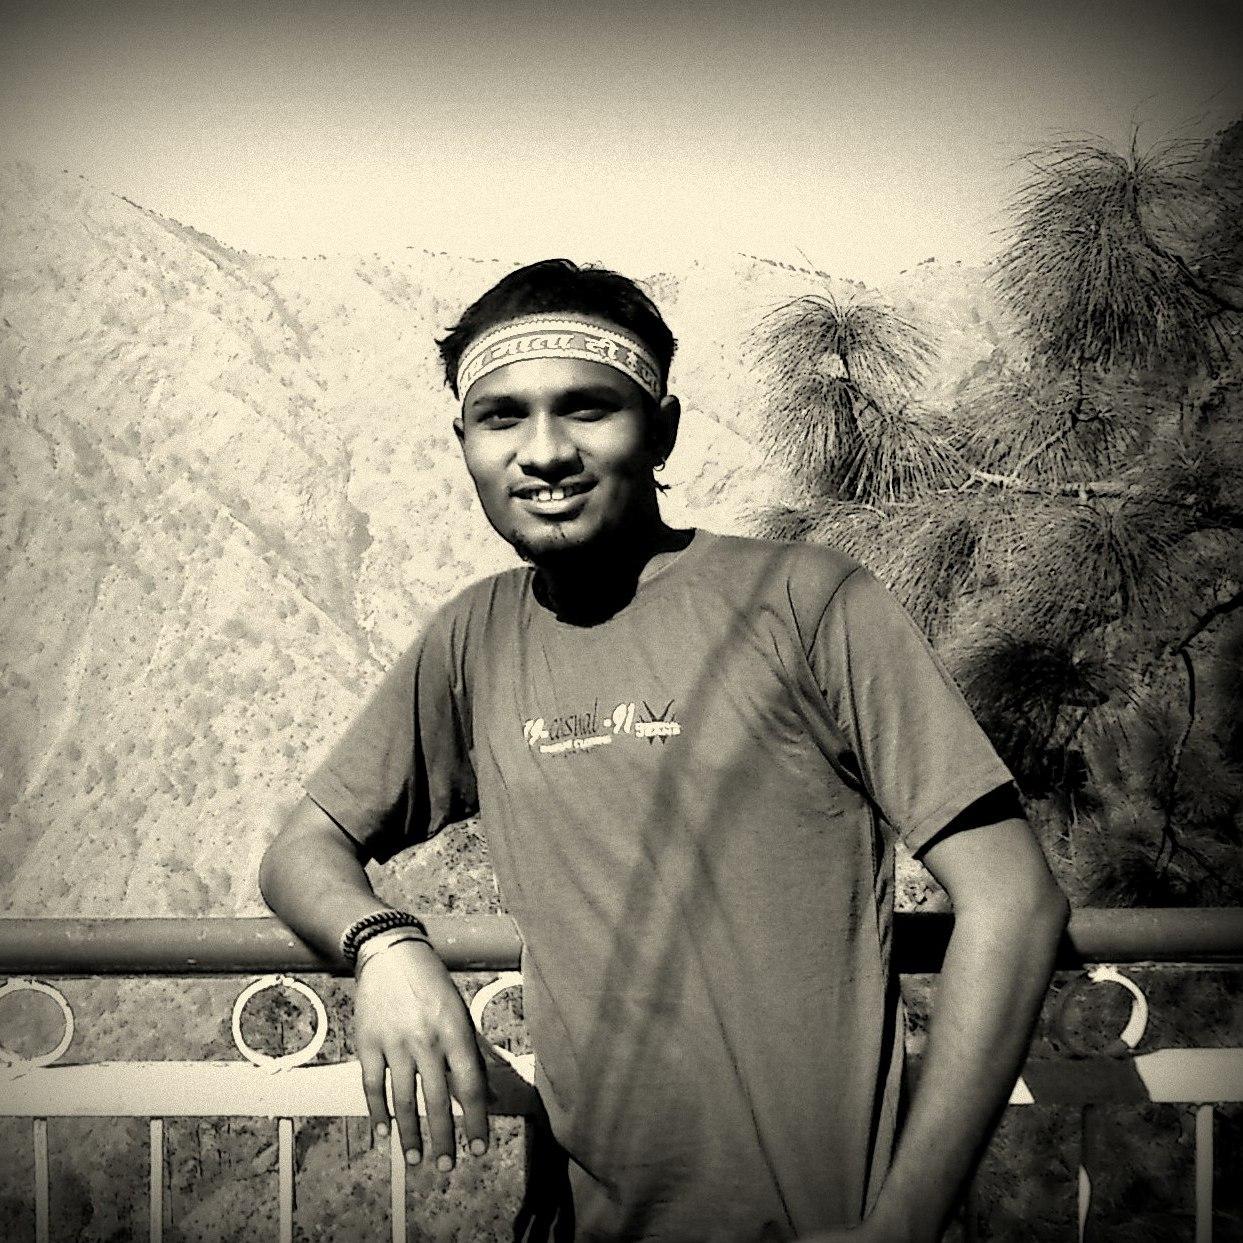 Sandip Gaikwad